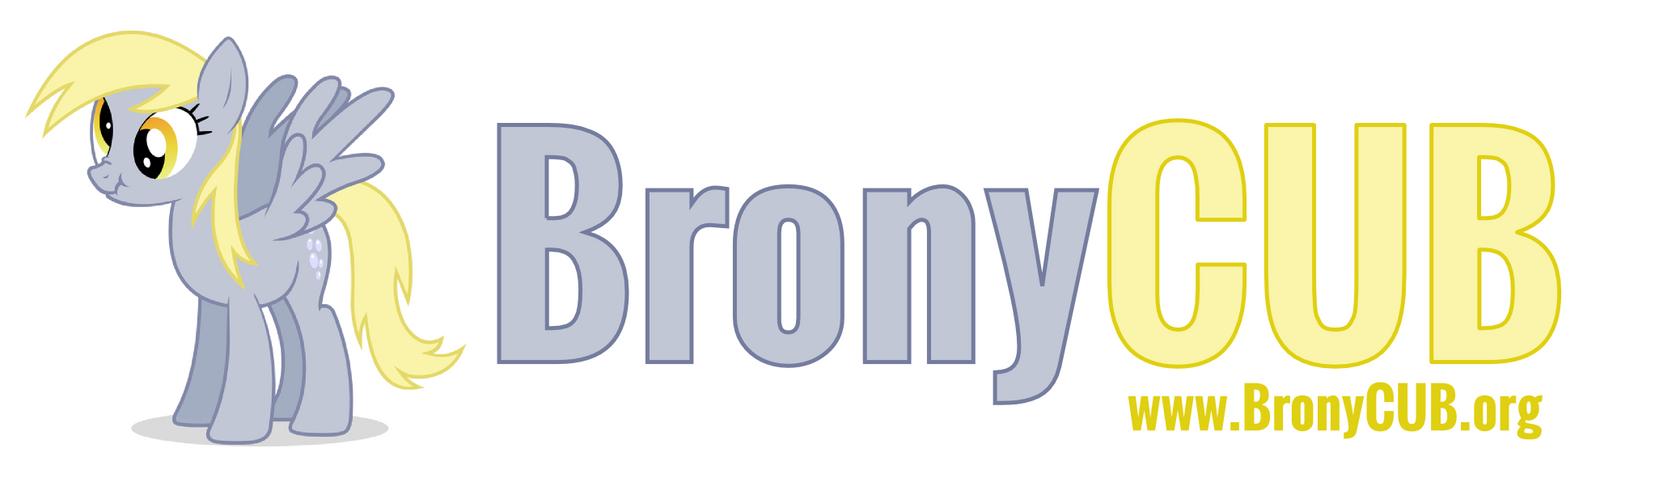 Derpy bronycub by adriens33